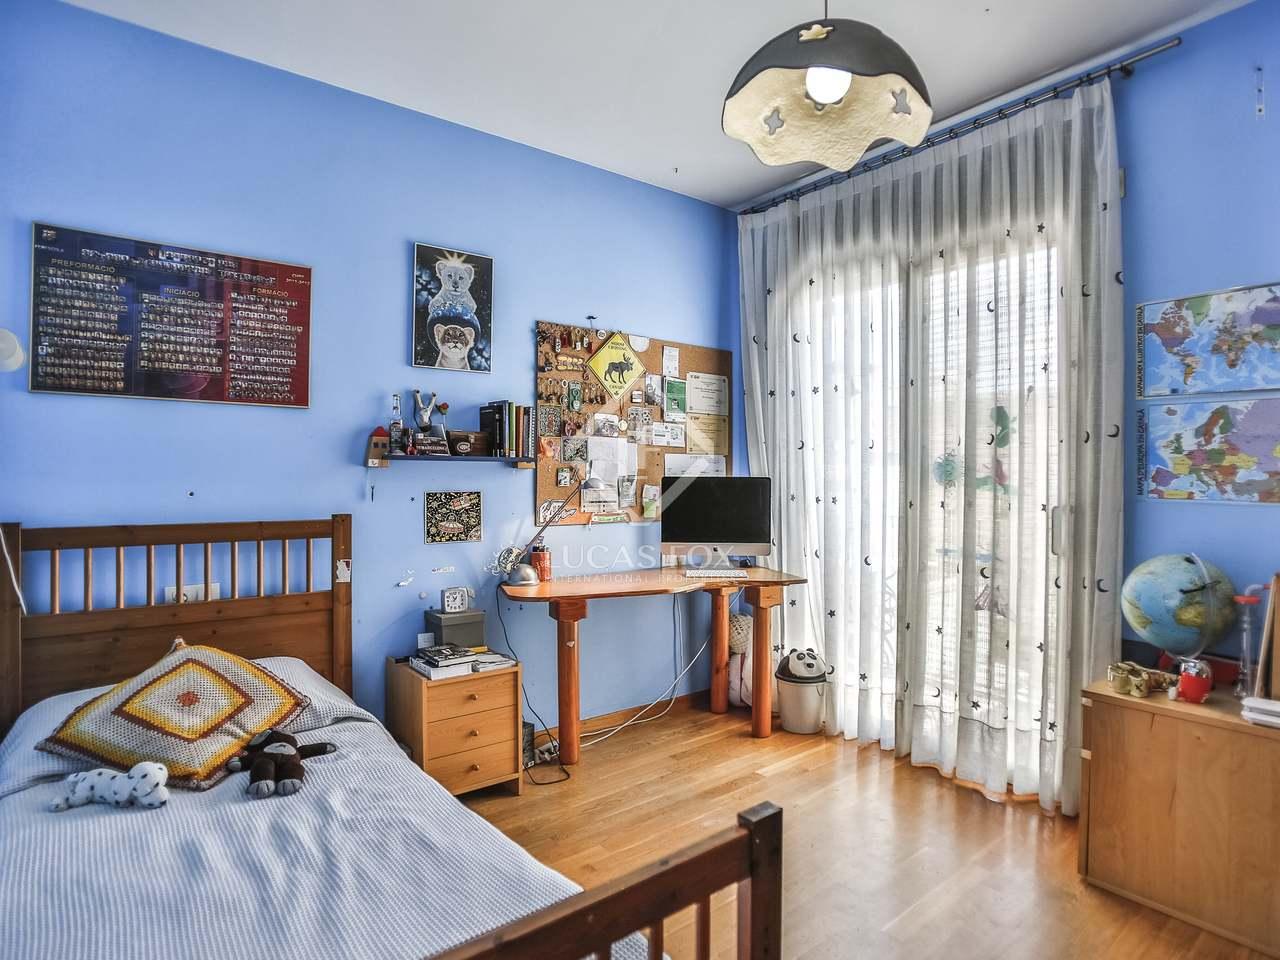 Piso de 165m con terraza en venta en vilanova i la geltr - Compartir piso vilanova i la geltru ...